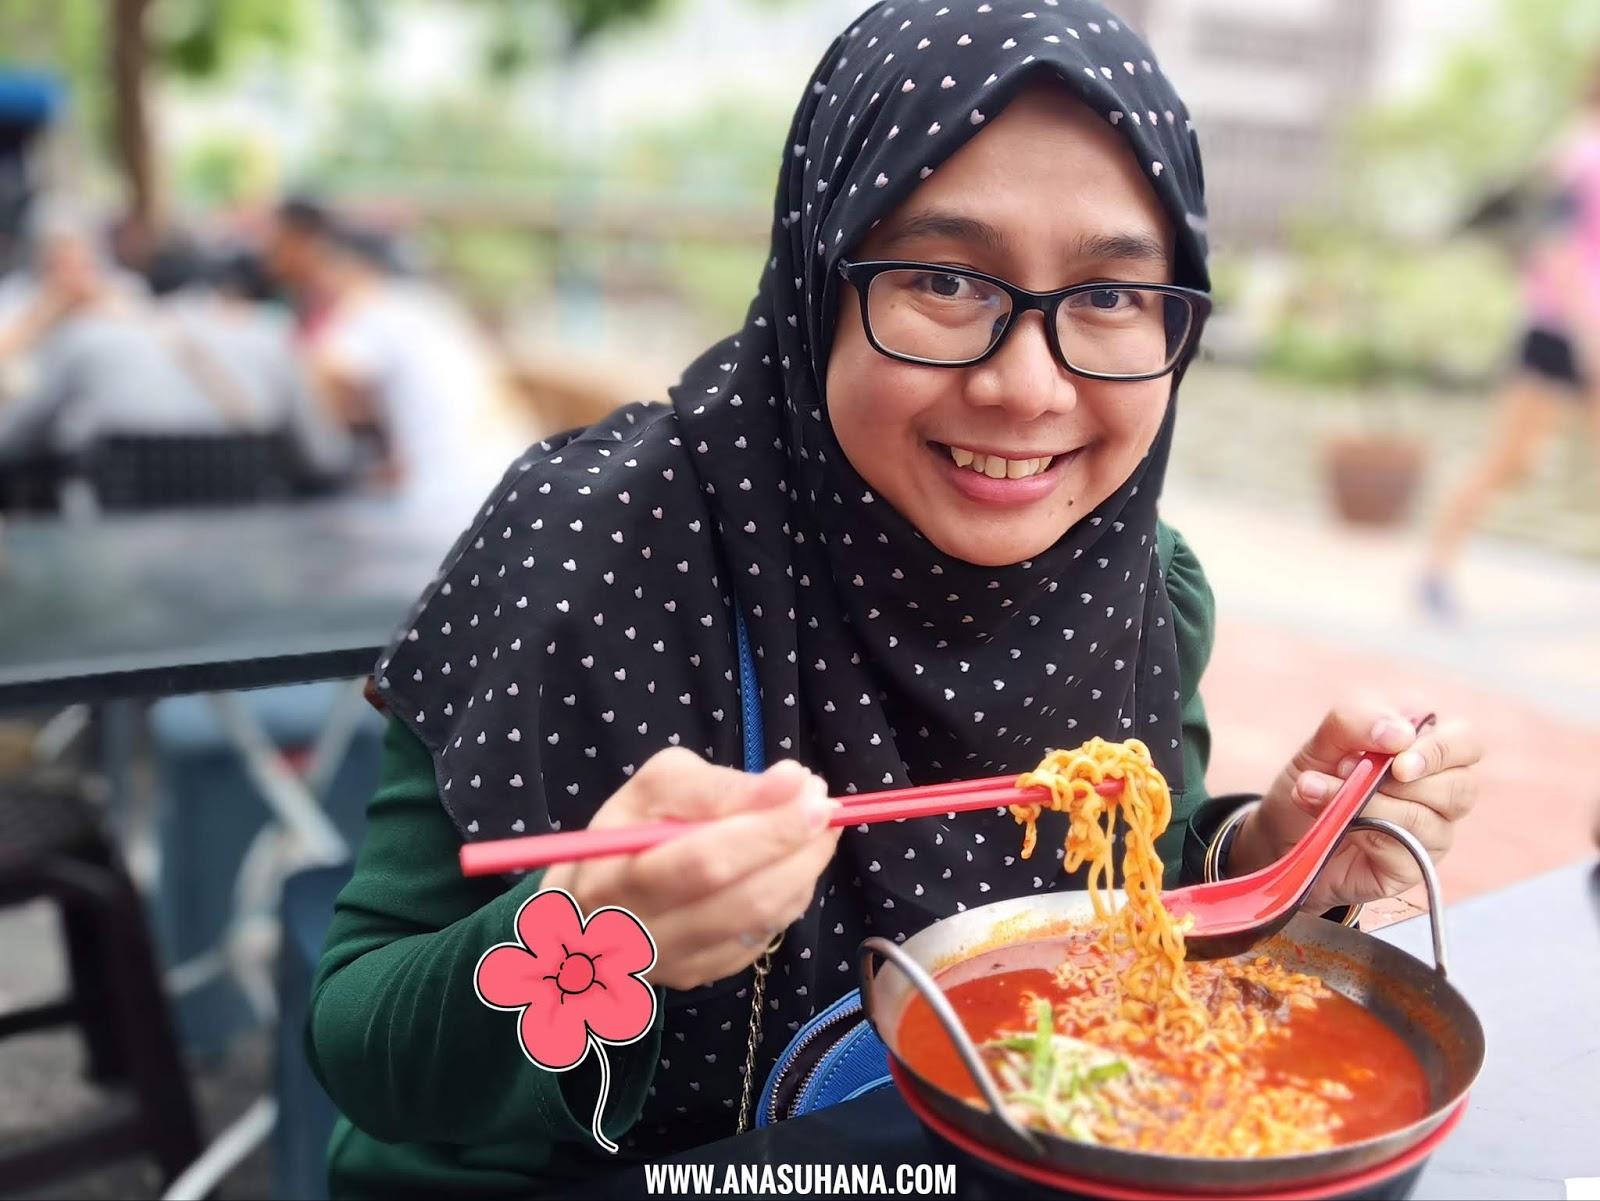 Ramen Asam Pedas vs Cendol Durian di Cendol Kampung Hulu Melaka